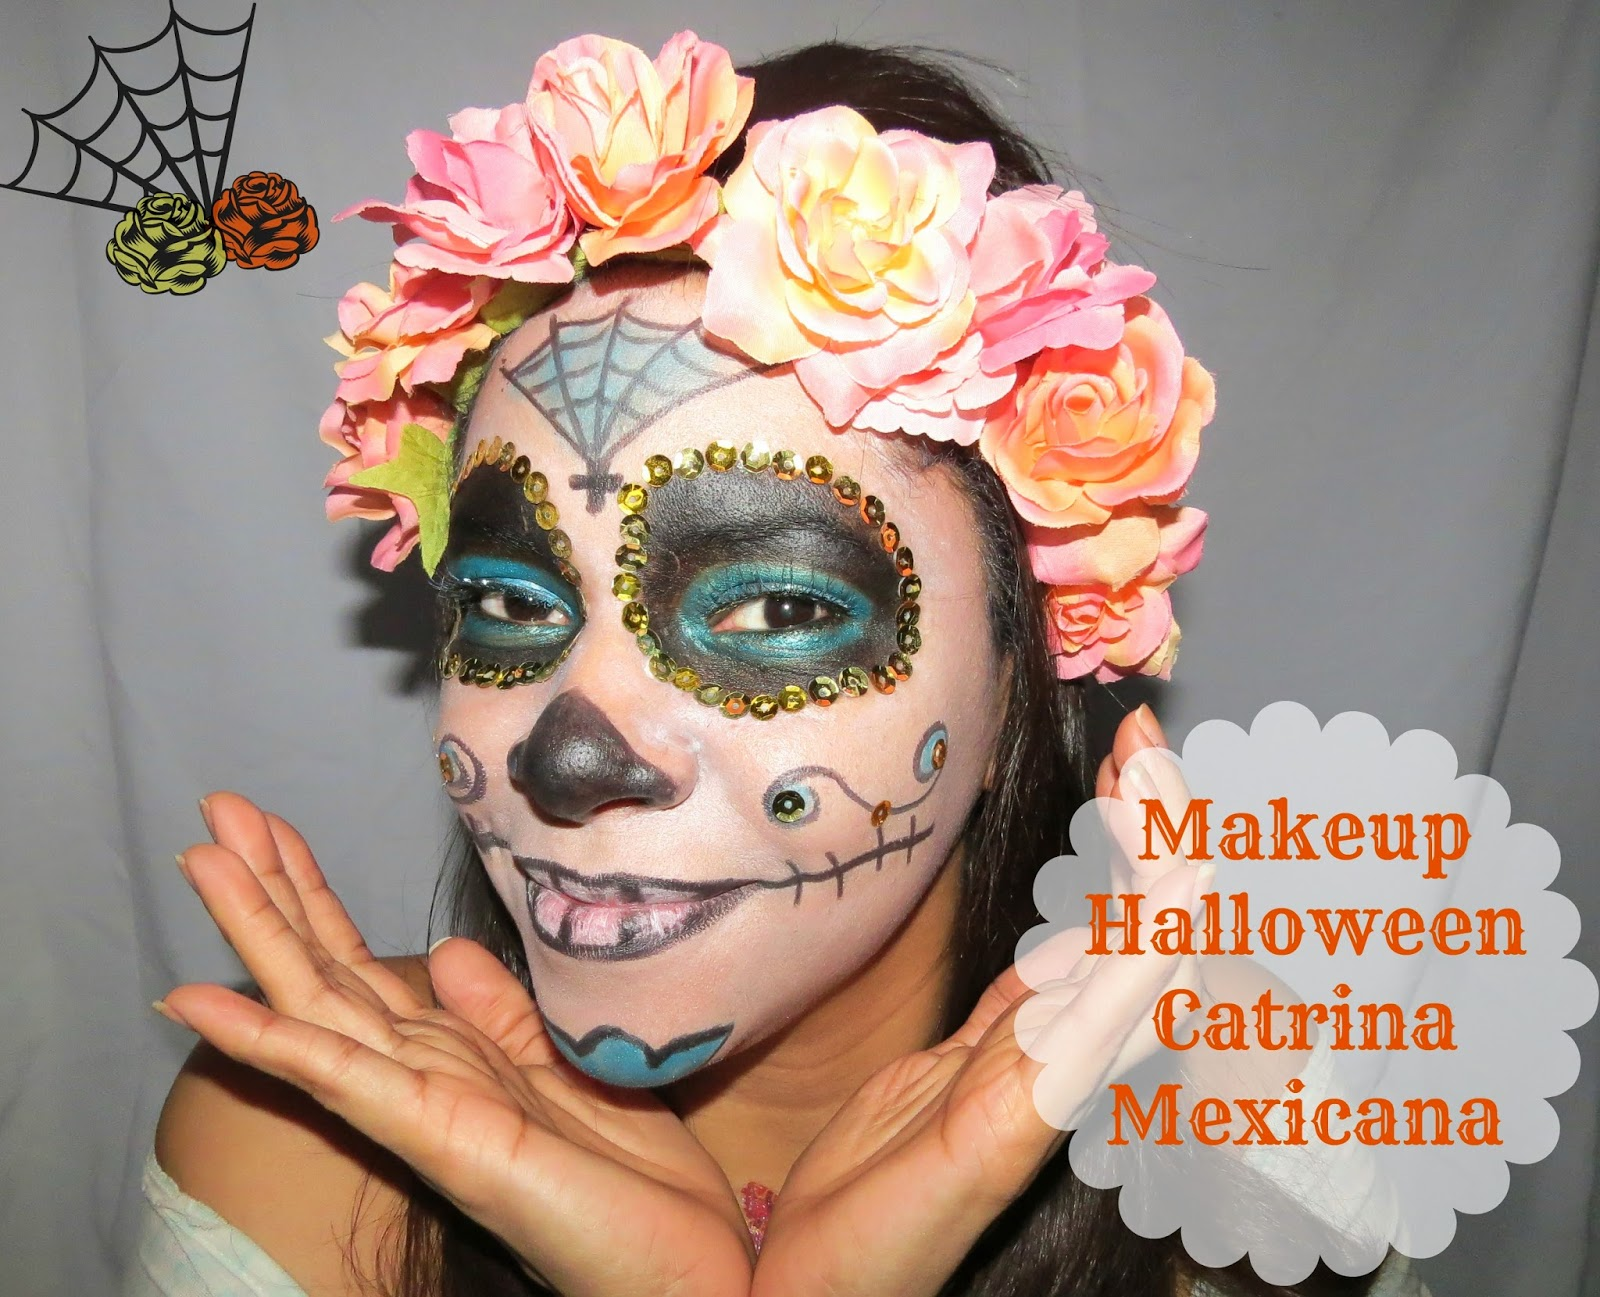 (Makeup) Maquillaje para Halloween , \u0026quot;Catrina Mexicana /Sugar Skull\u0026quot;. Hola Chicas\u2026